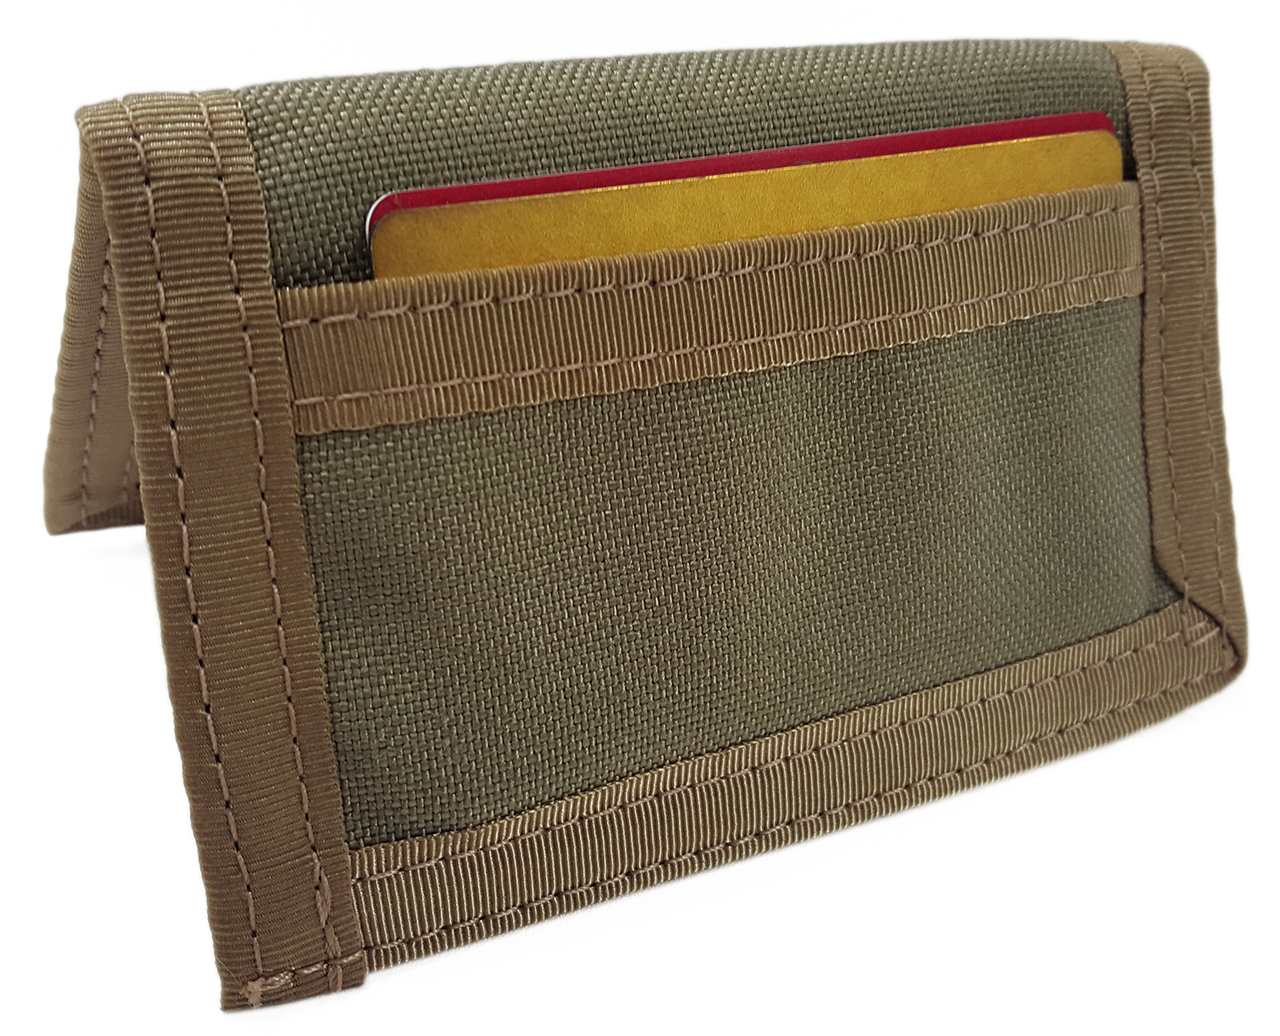 Kley-Zion Compact Wallet